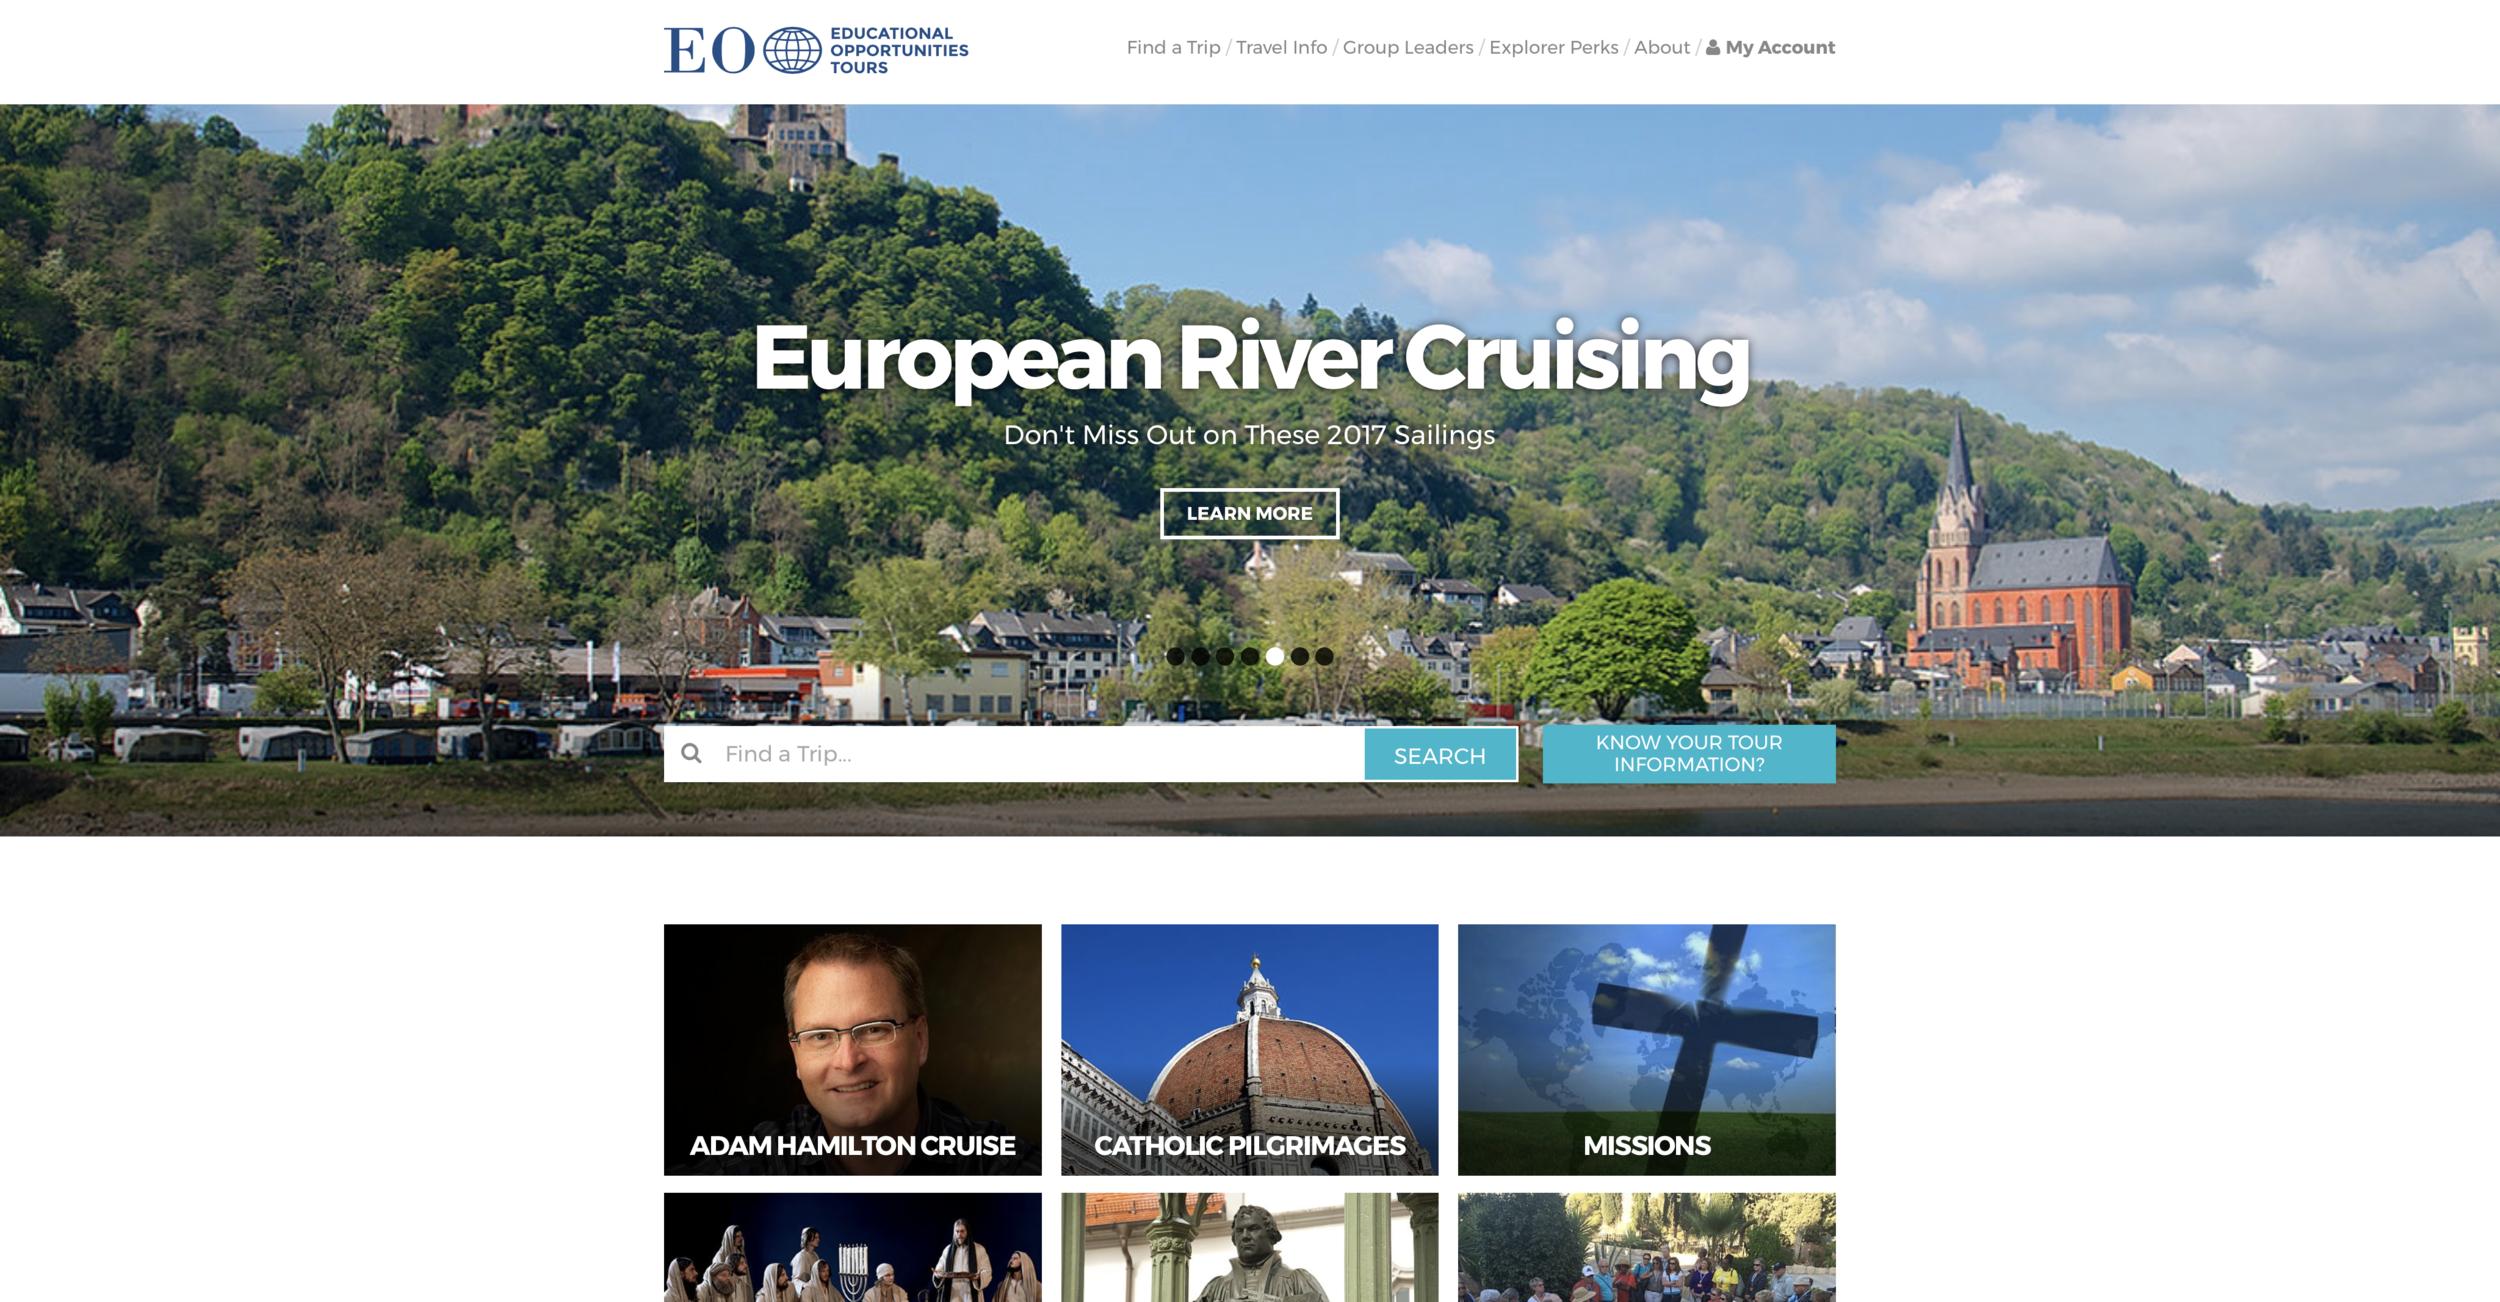 www.eo.travel